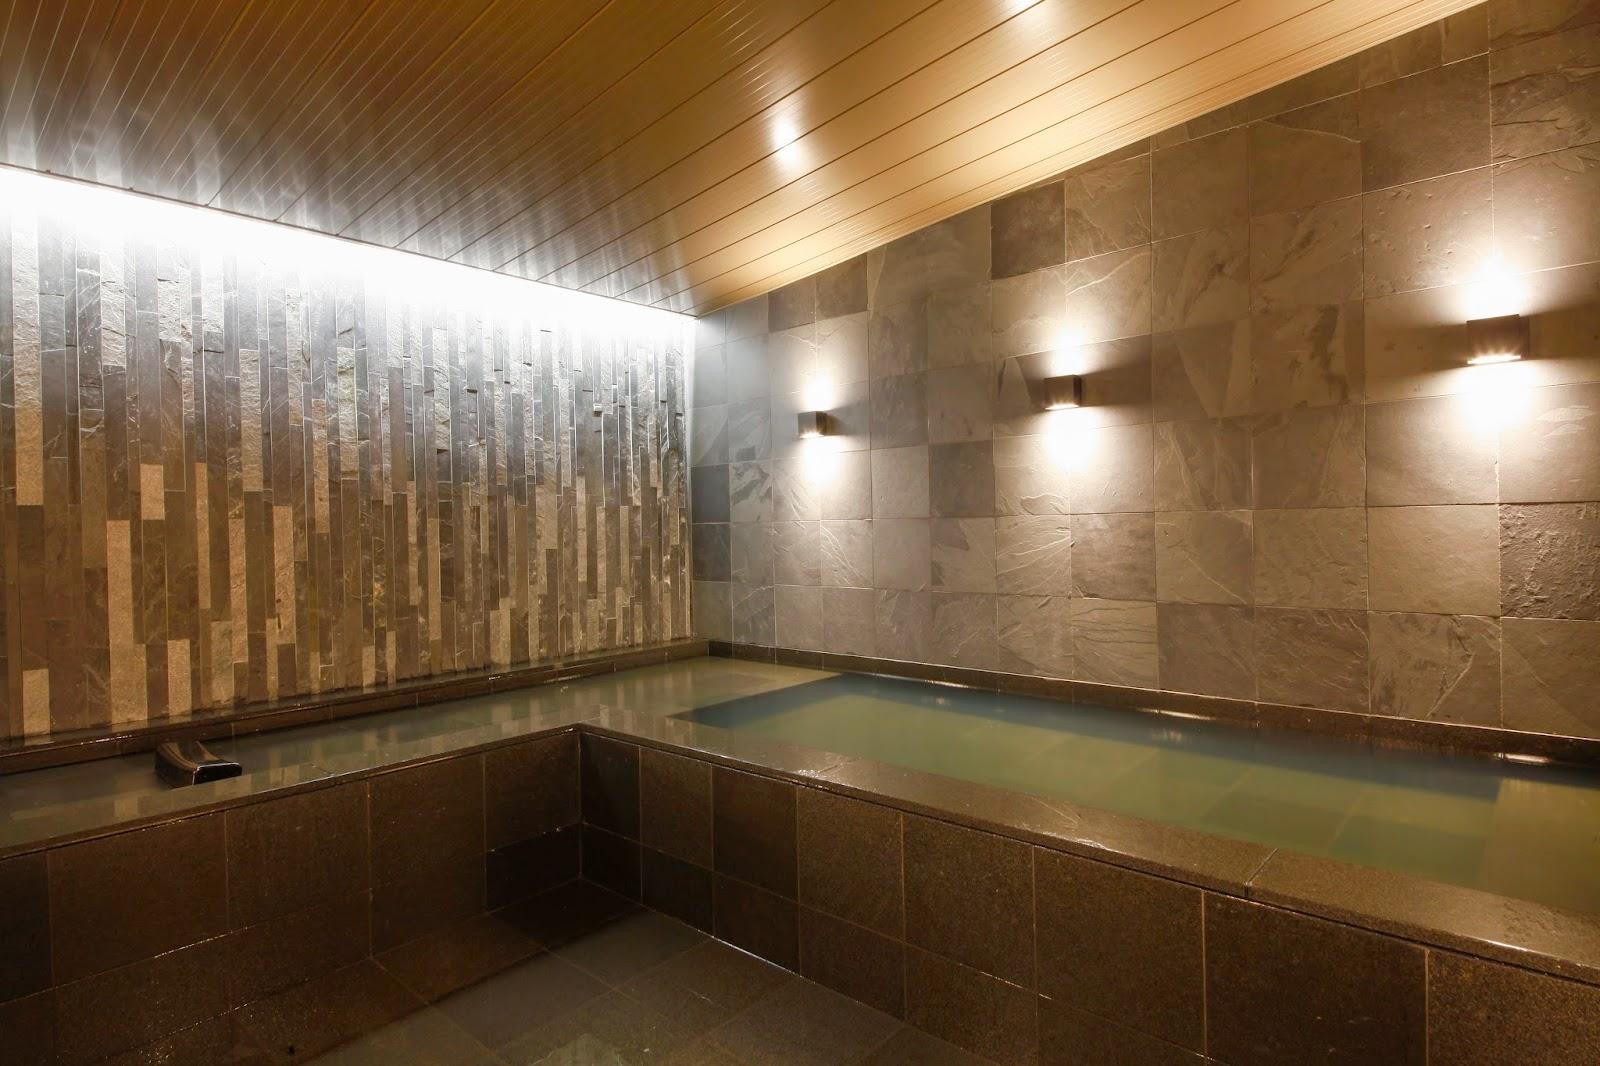 Kyoto arashiyama onsen ryokan togetsutei the private bath - Ryokan tokyo with private bathroom ...